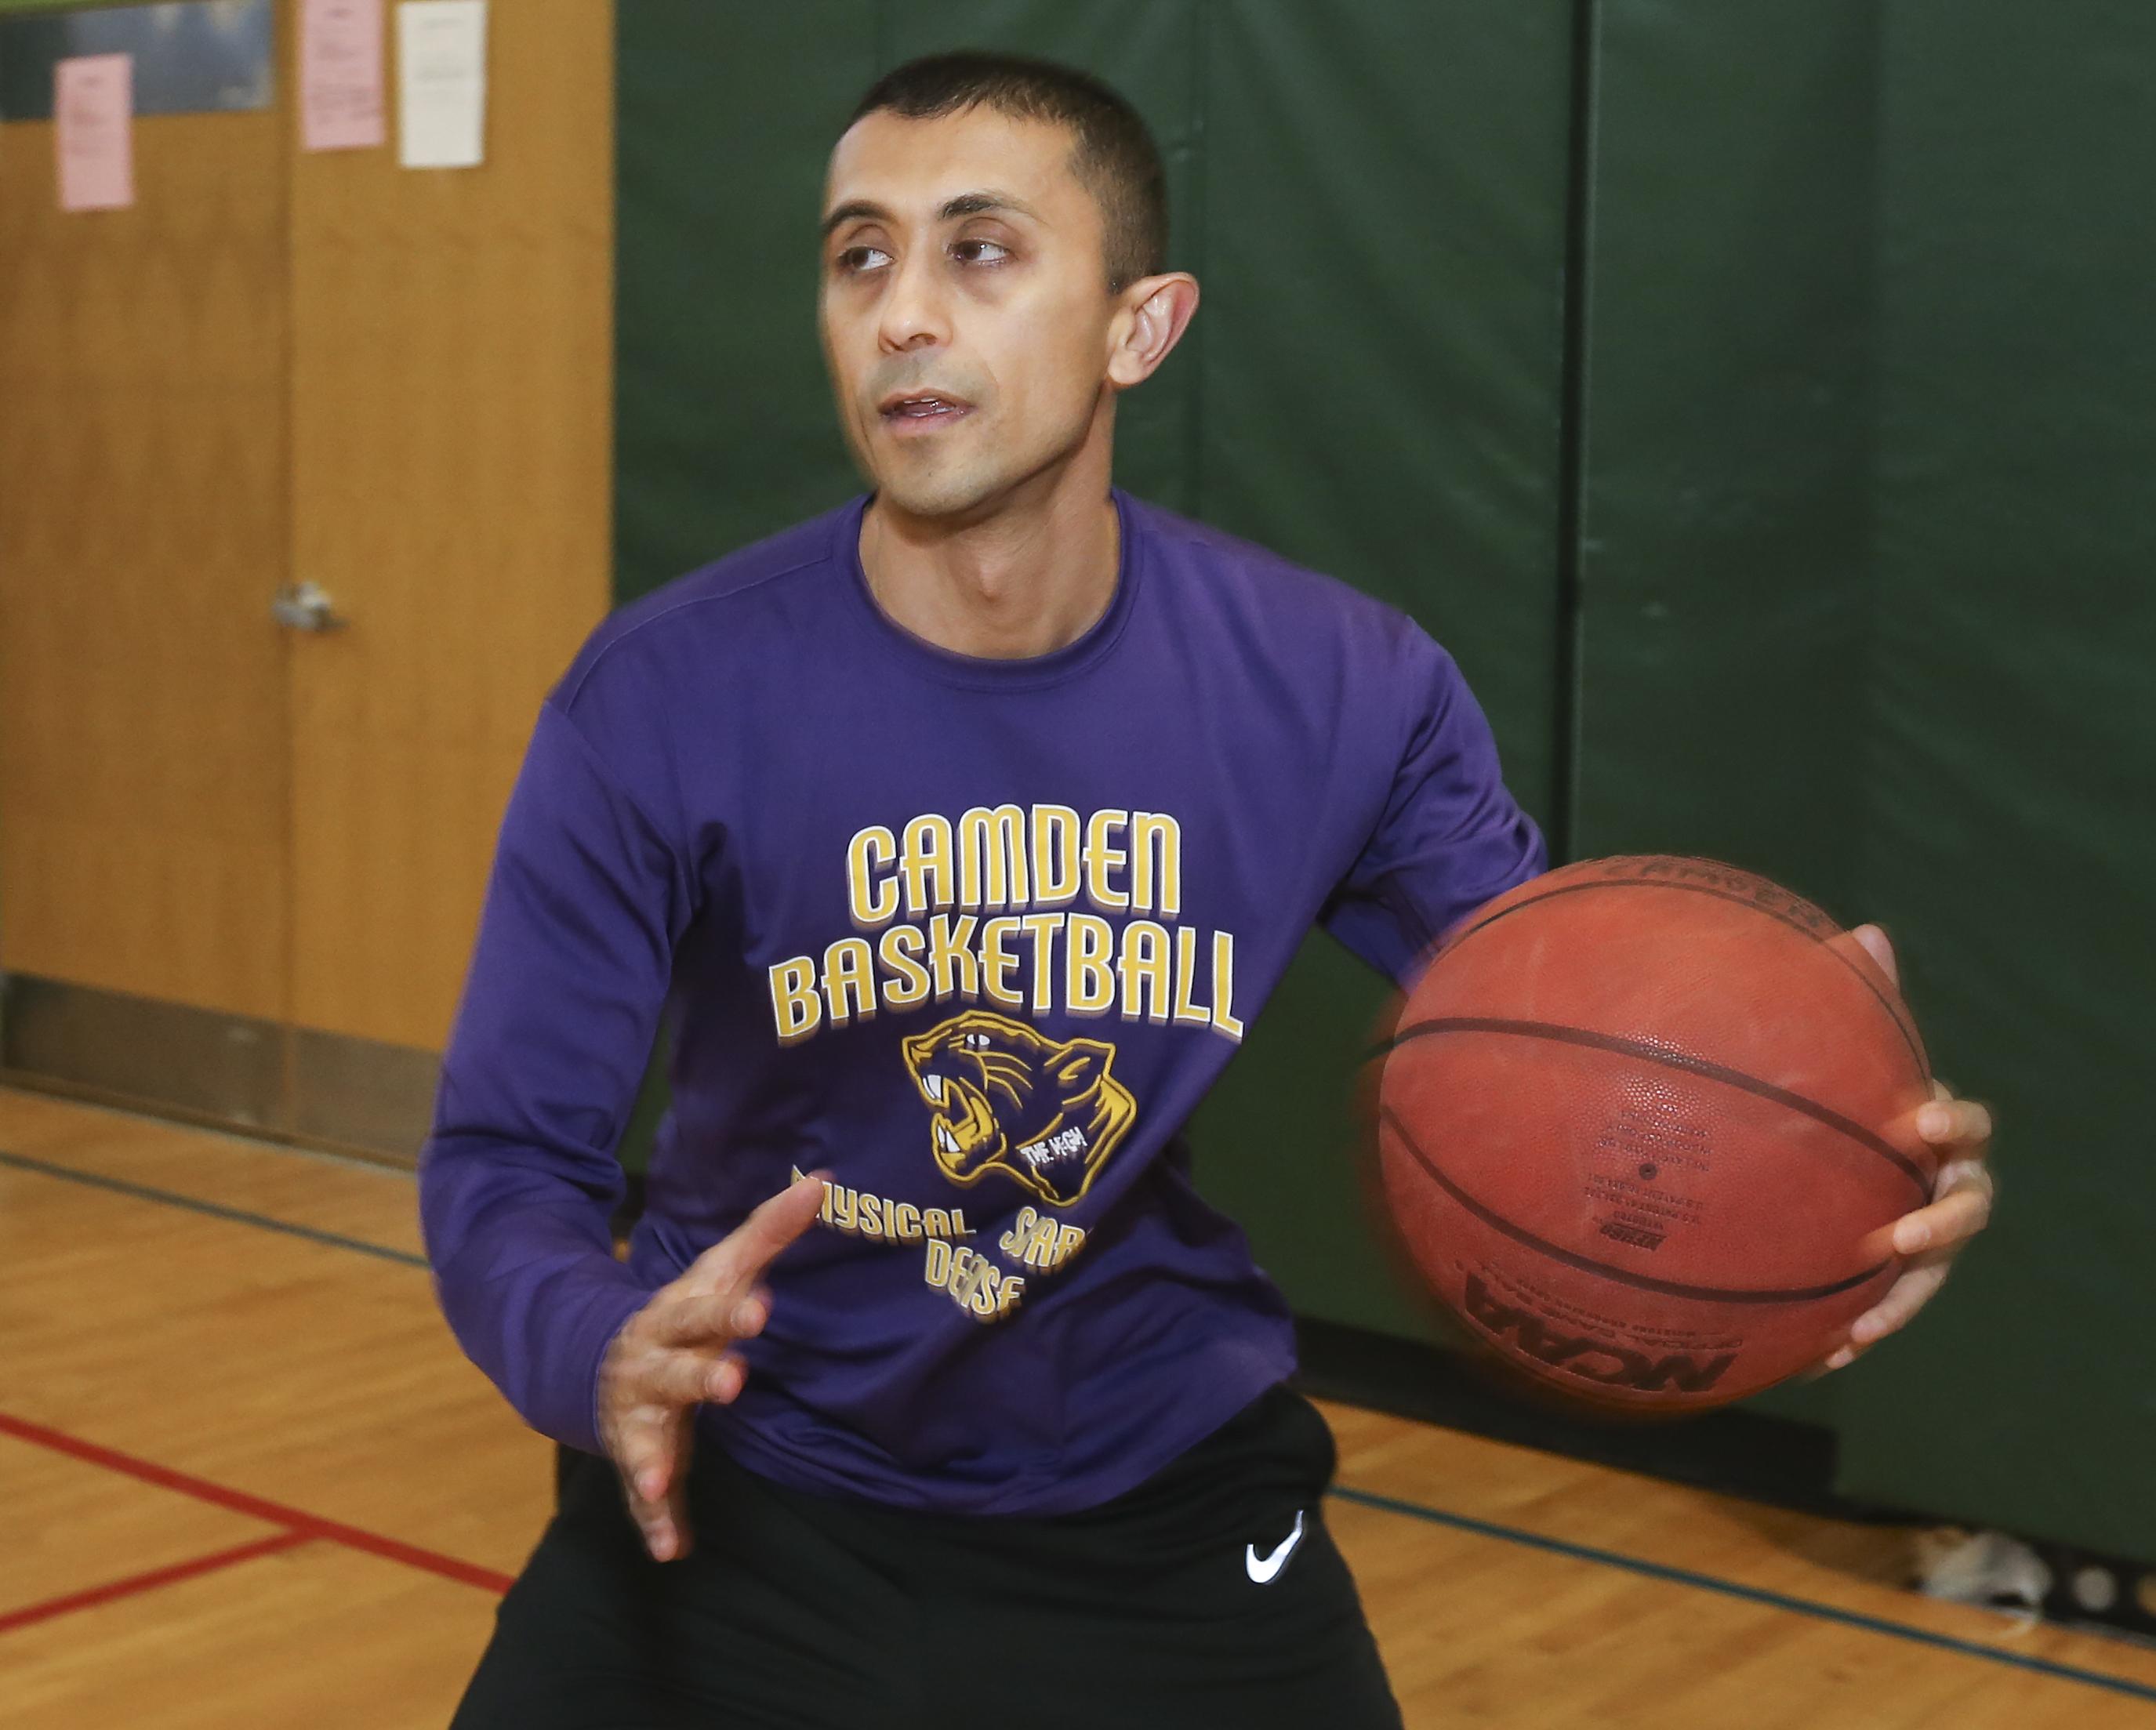 Camden School superintendent Paymon Rouhanfard is an assistant basketball coach at Camden Creative Arts High School. Rouhanfard at practice, Tuesday, January 30, 2018 . STEVEN M. FALK / Staff Photographer